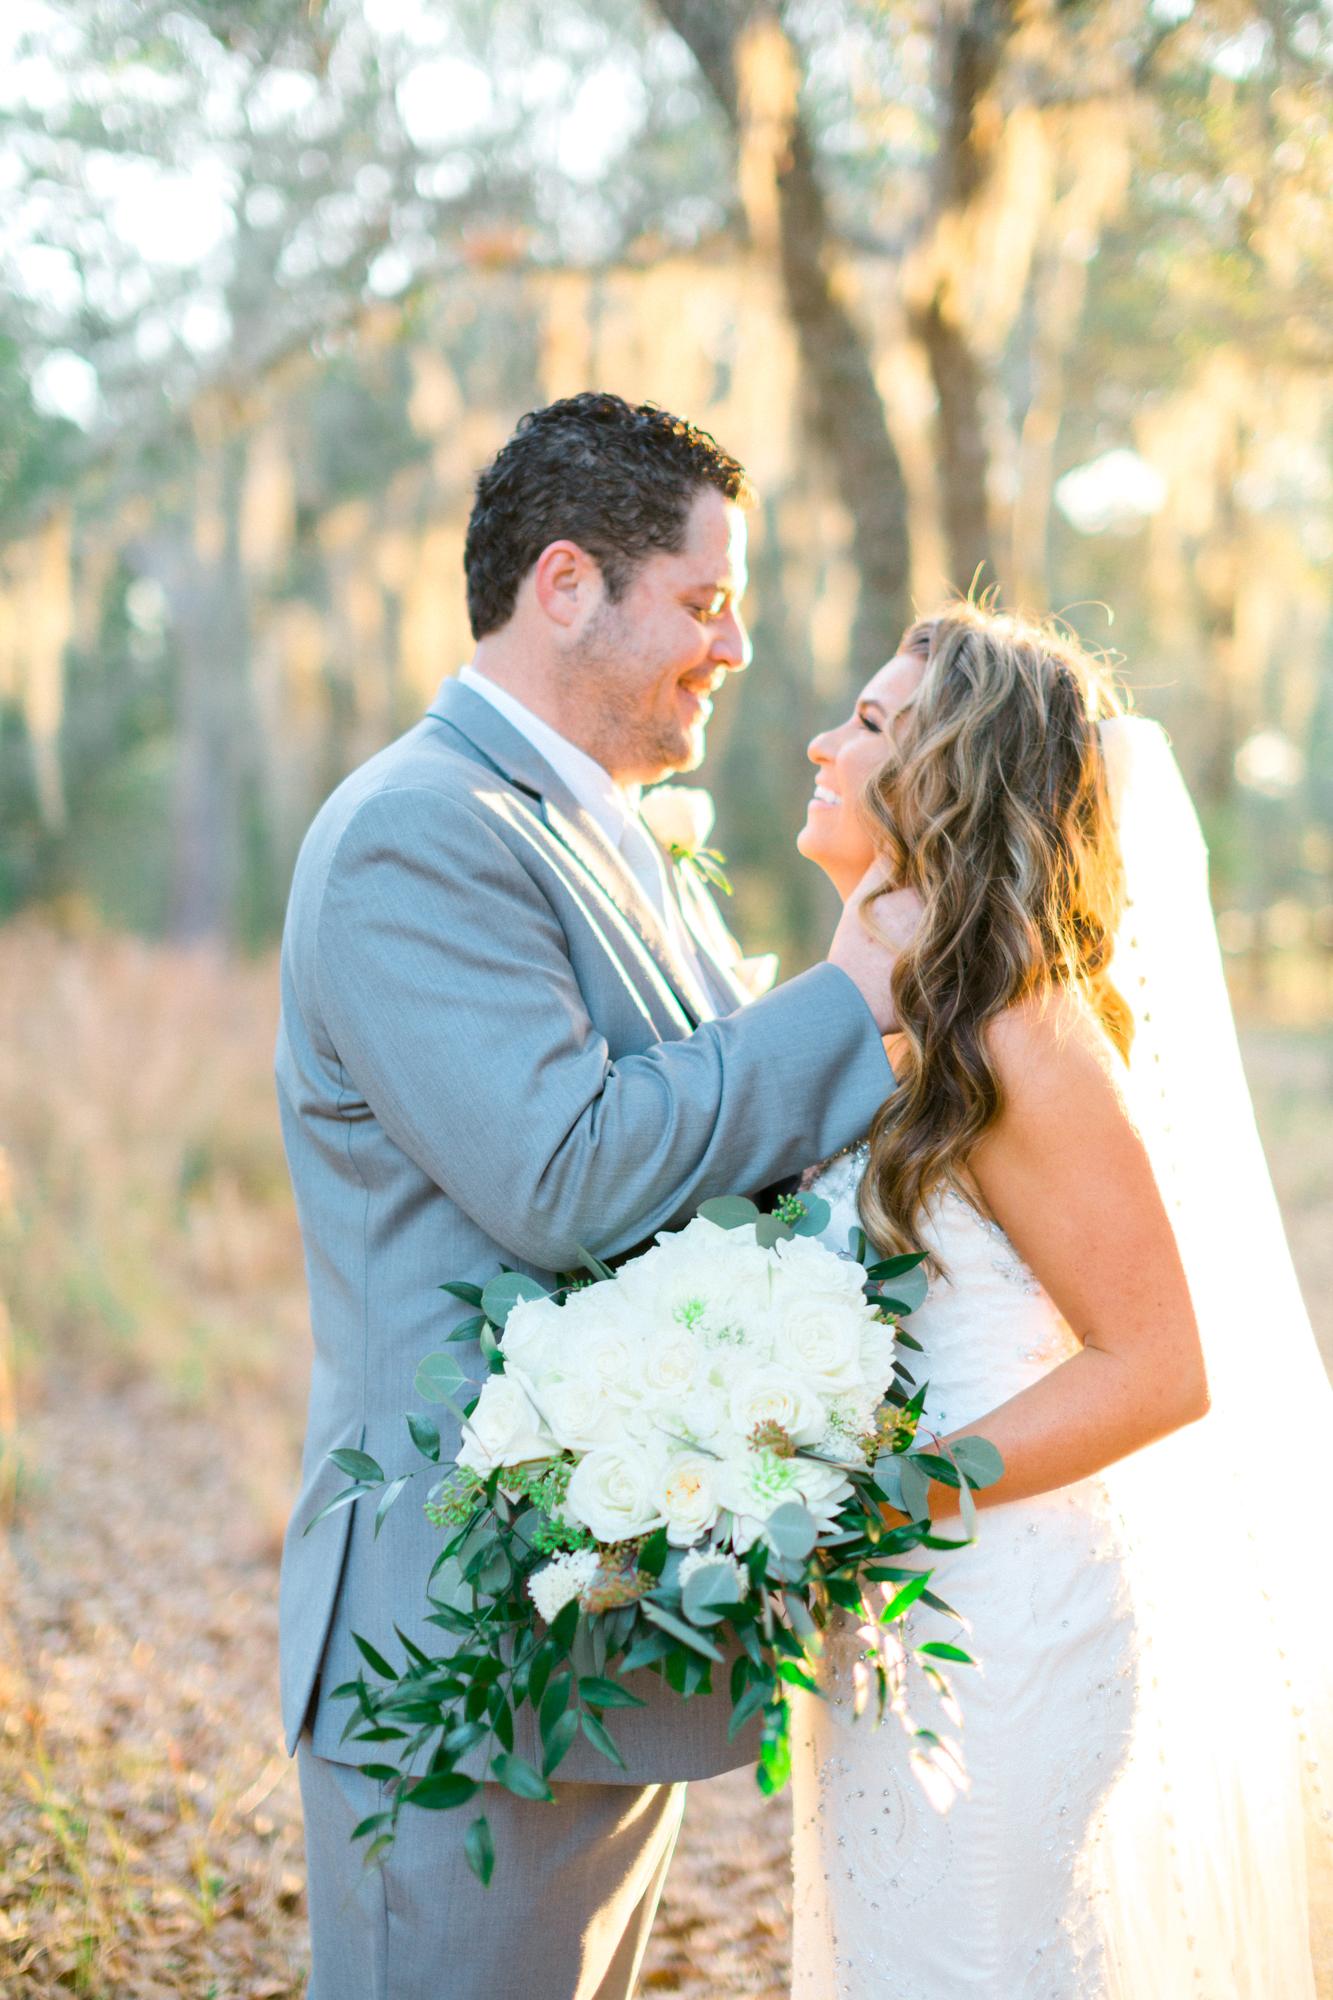 jessica-bellinger-photography-harmony-golf-preserve-wedding-photos-9327.jpg